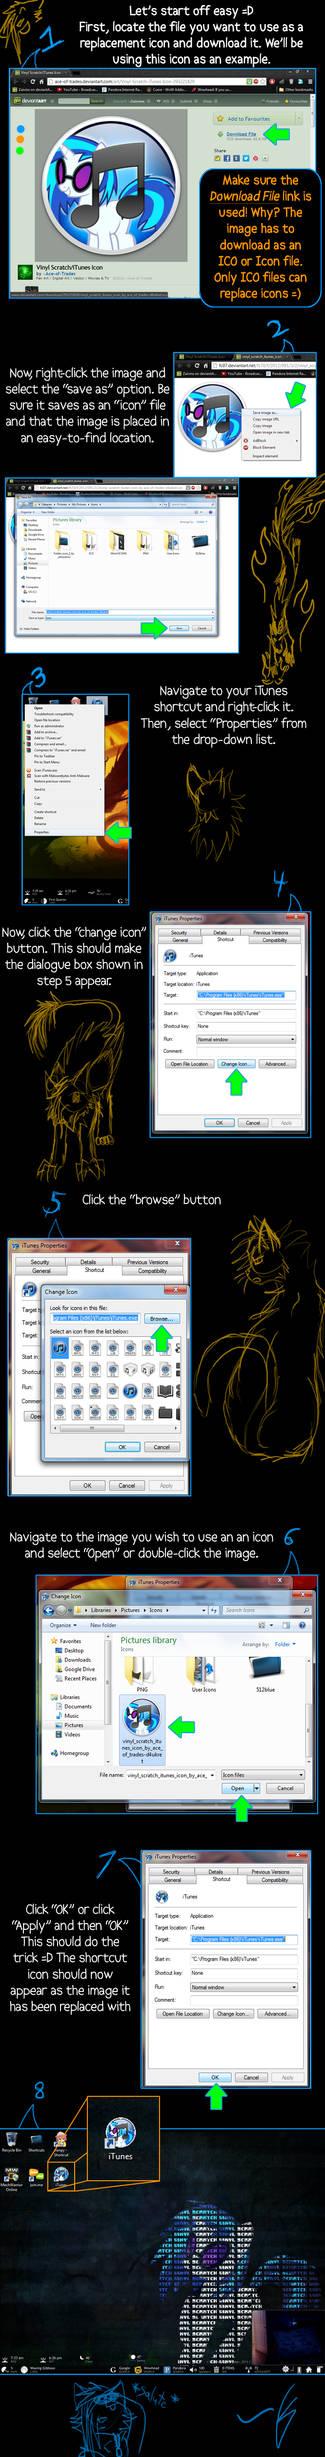 Tutorial: Replacing Shortcut Icons